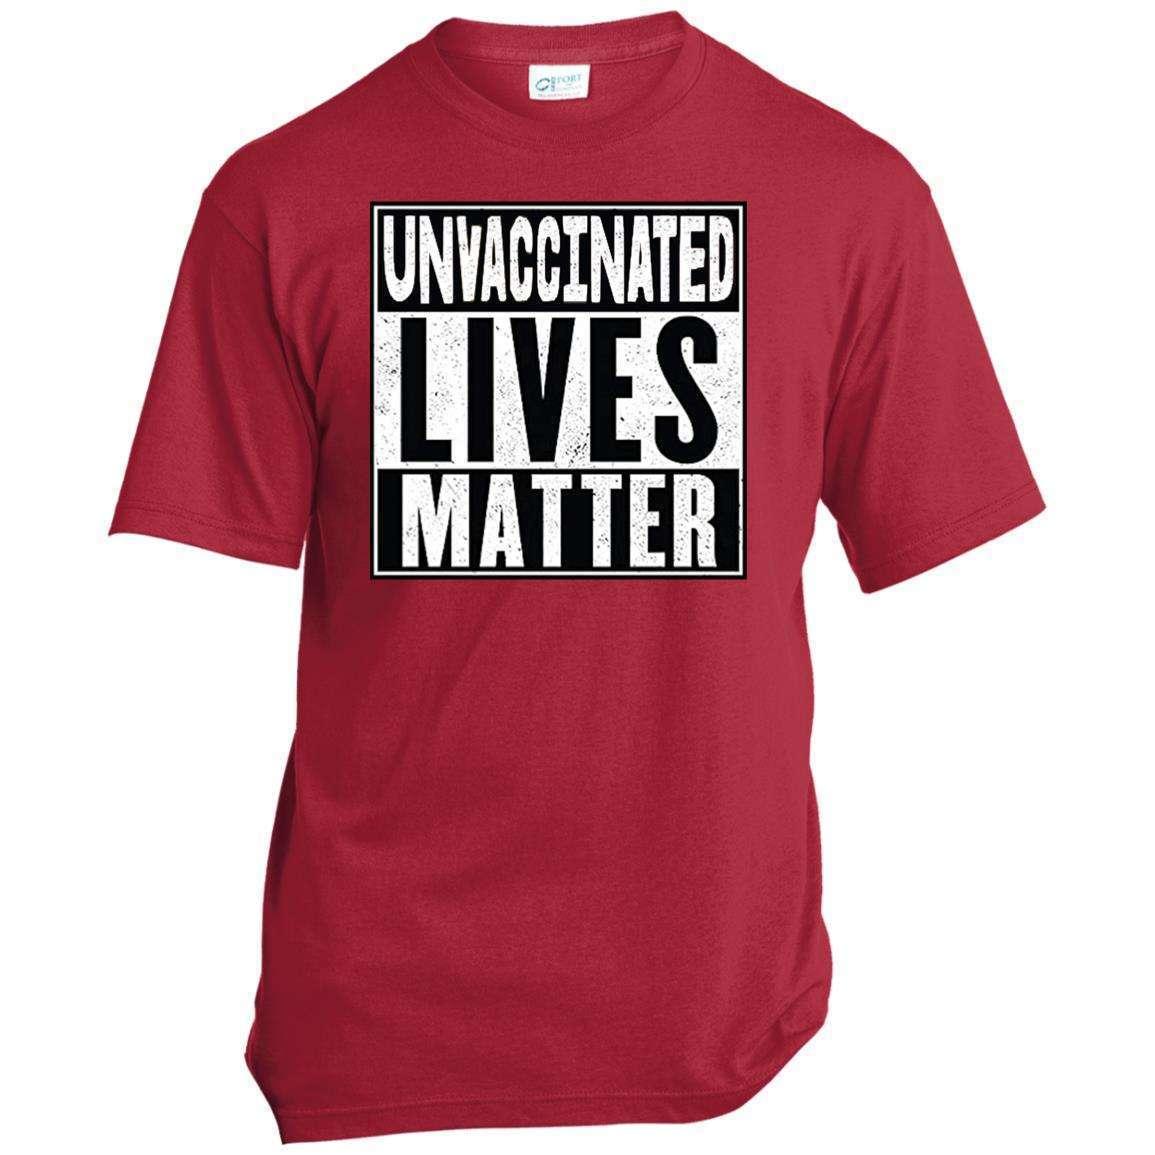 Unvaccinated Lives Matter T Shirt (6 Variants)